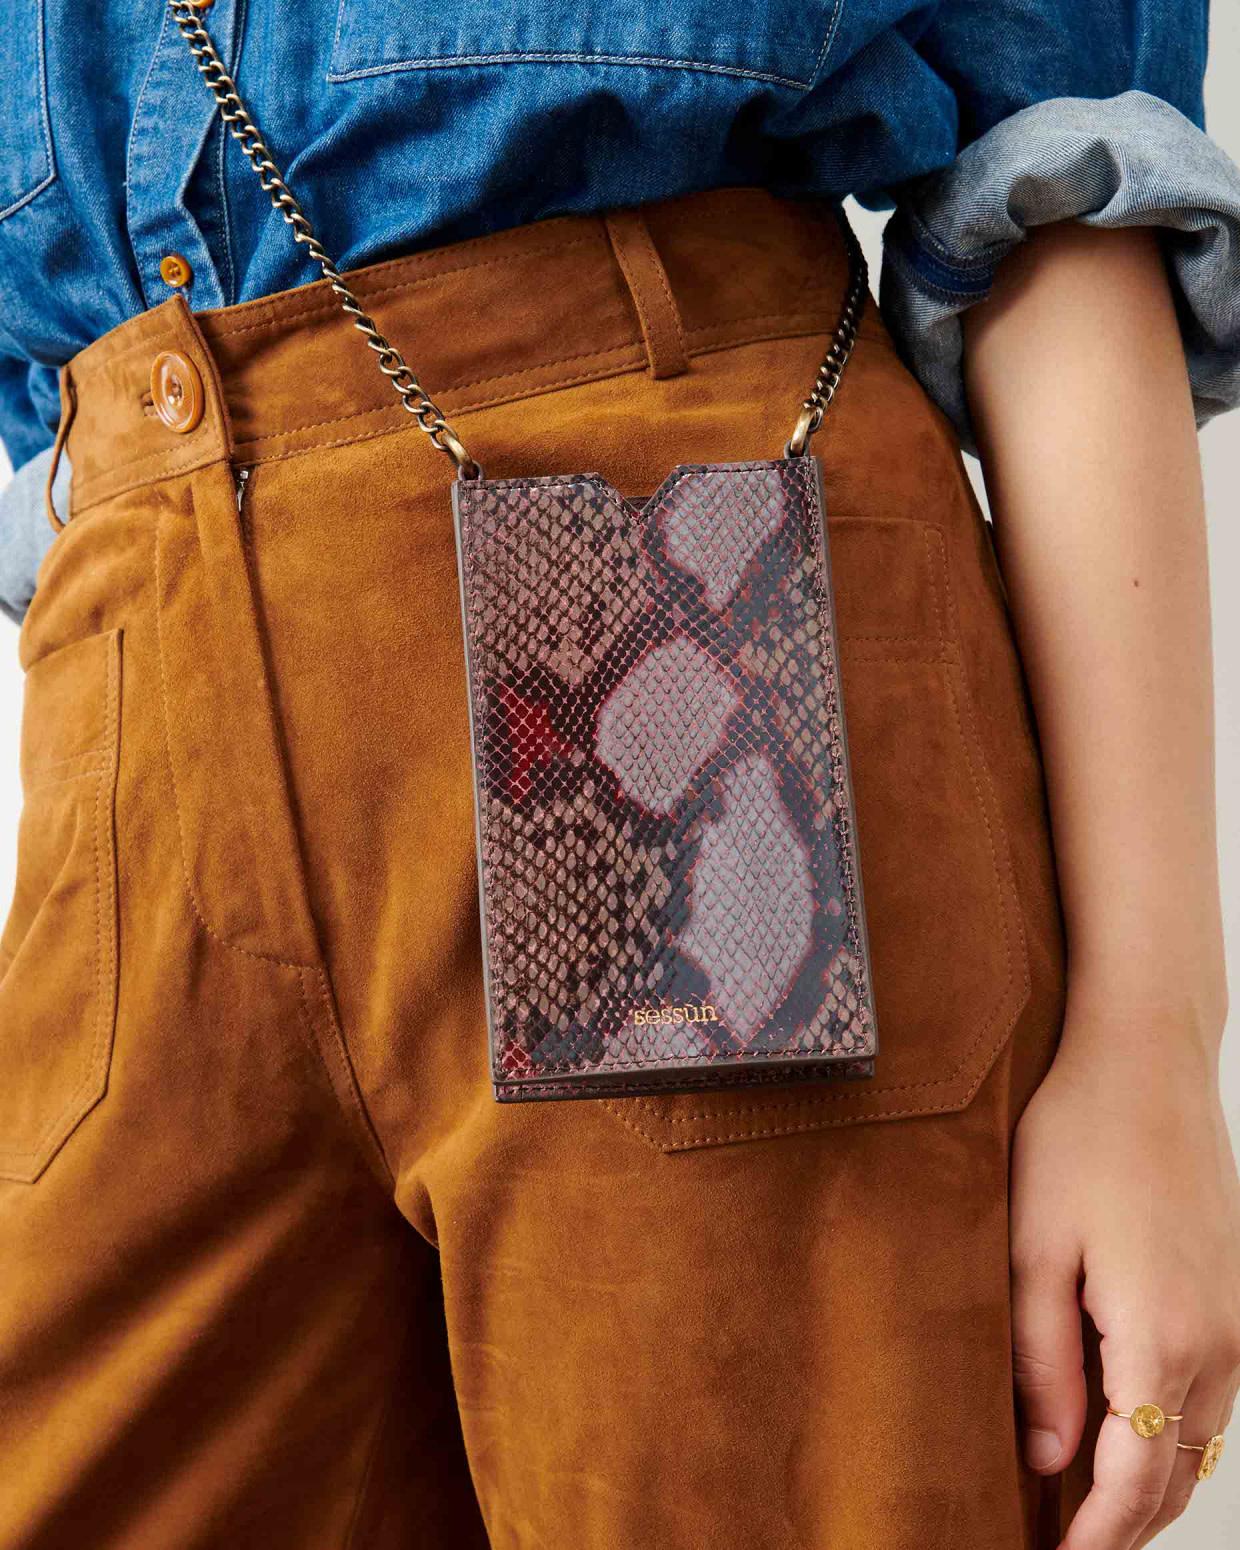 ama pyth phone bag-1